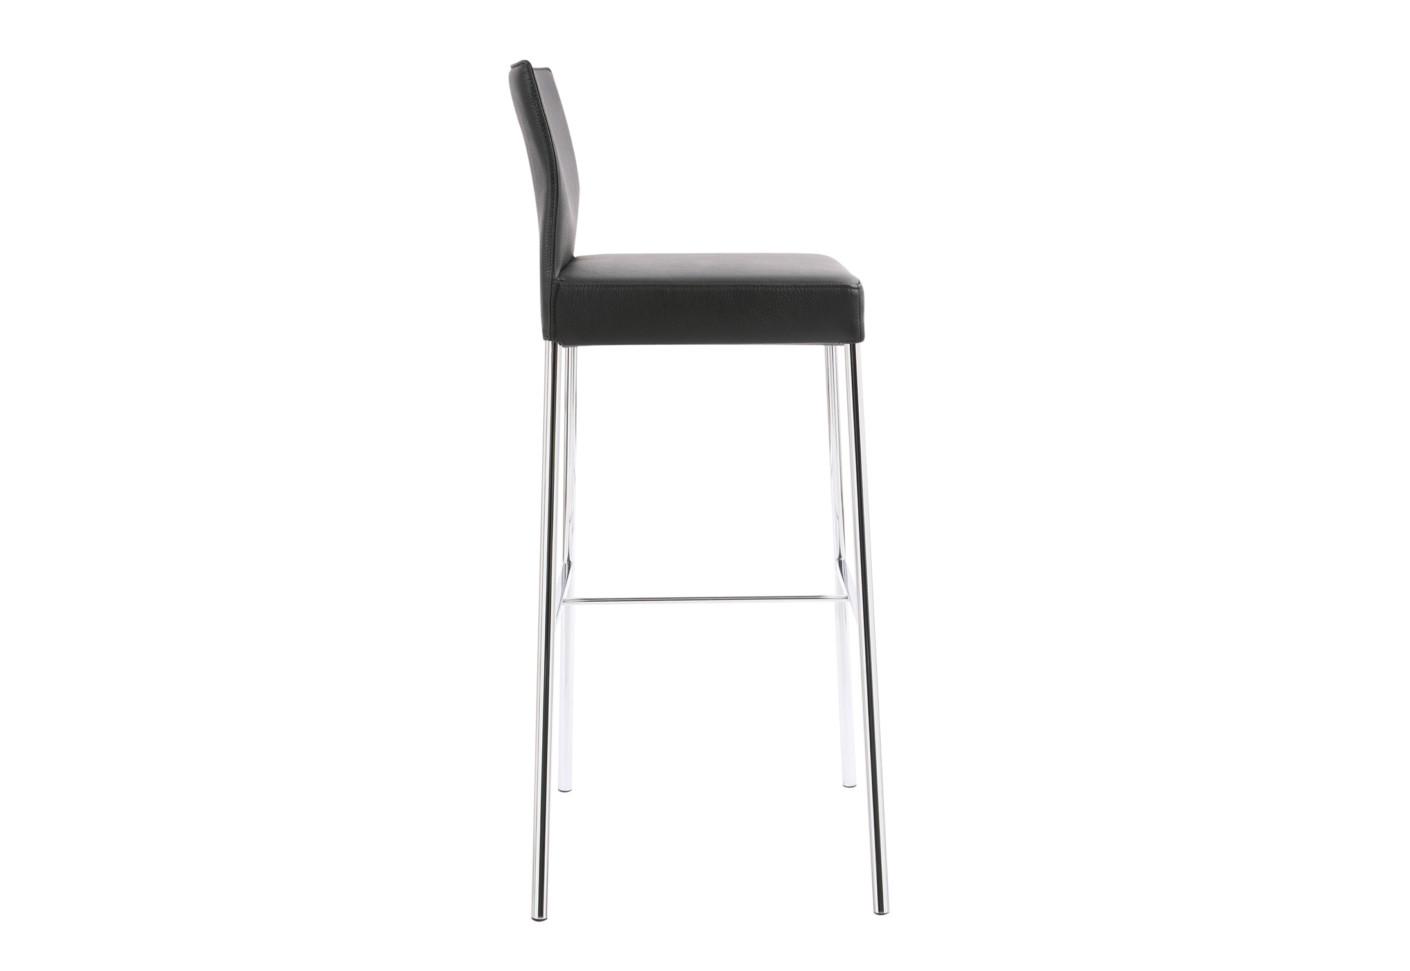 glooh barhocker polster von kff stylepark. Black Bedroom Furniture Sets. Home Design Ideas